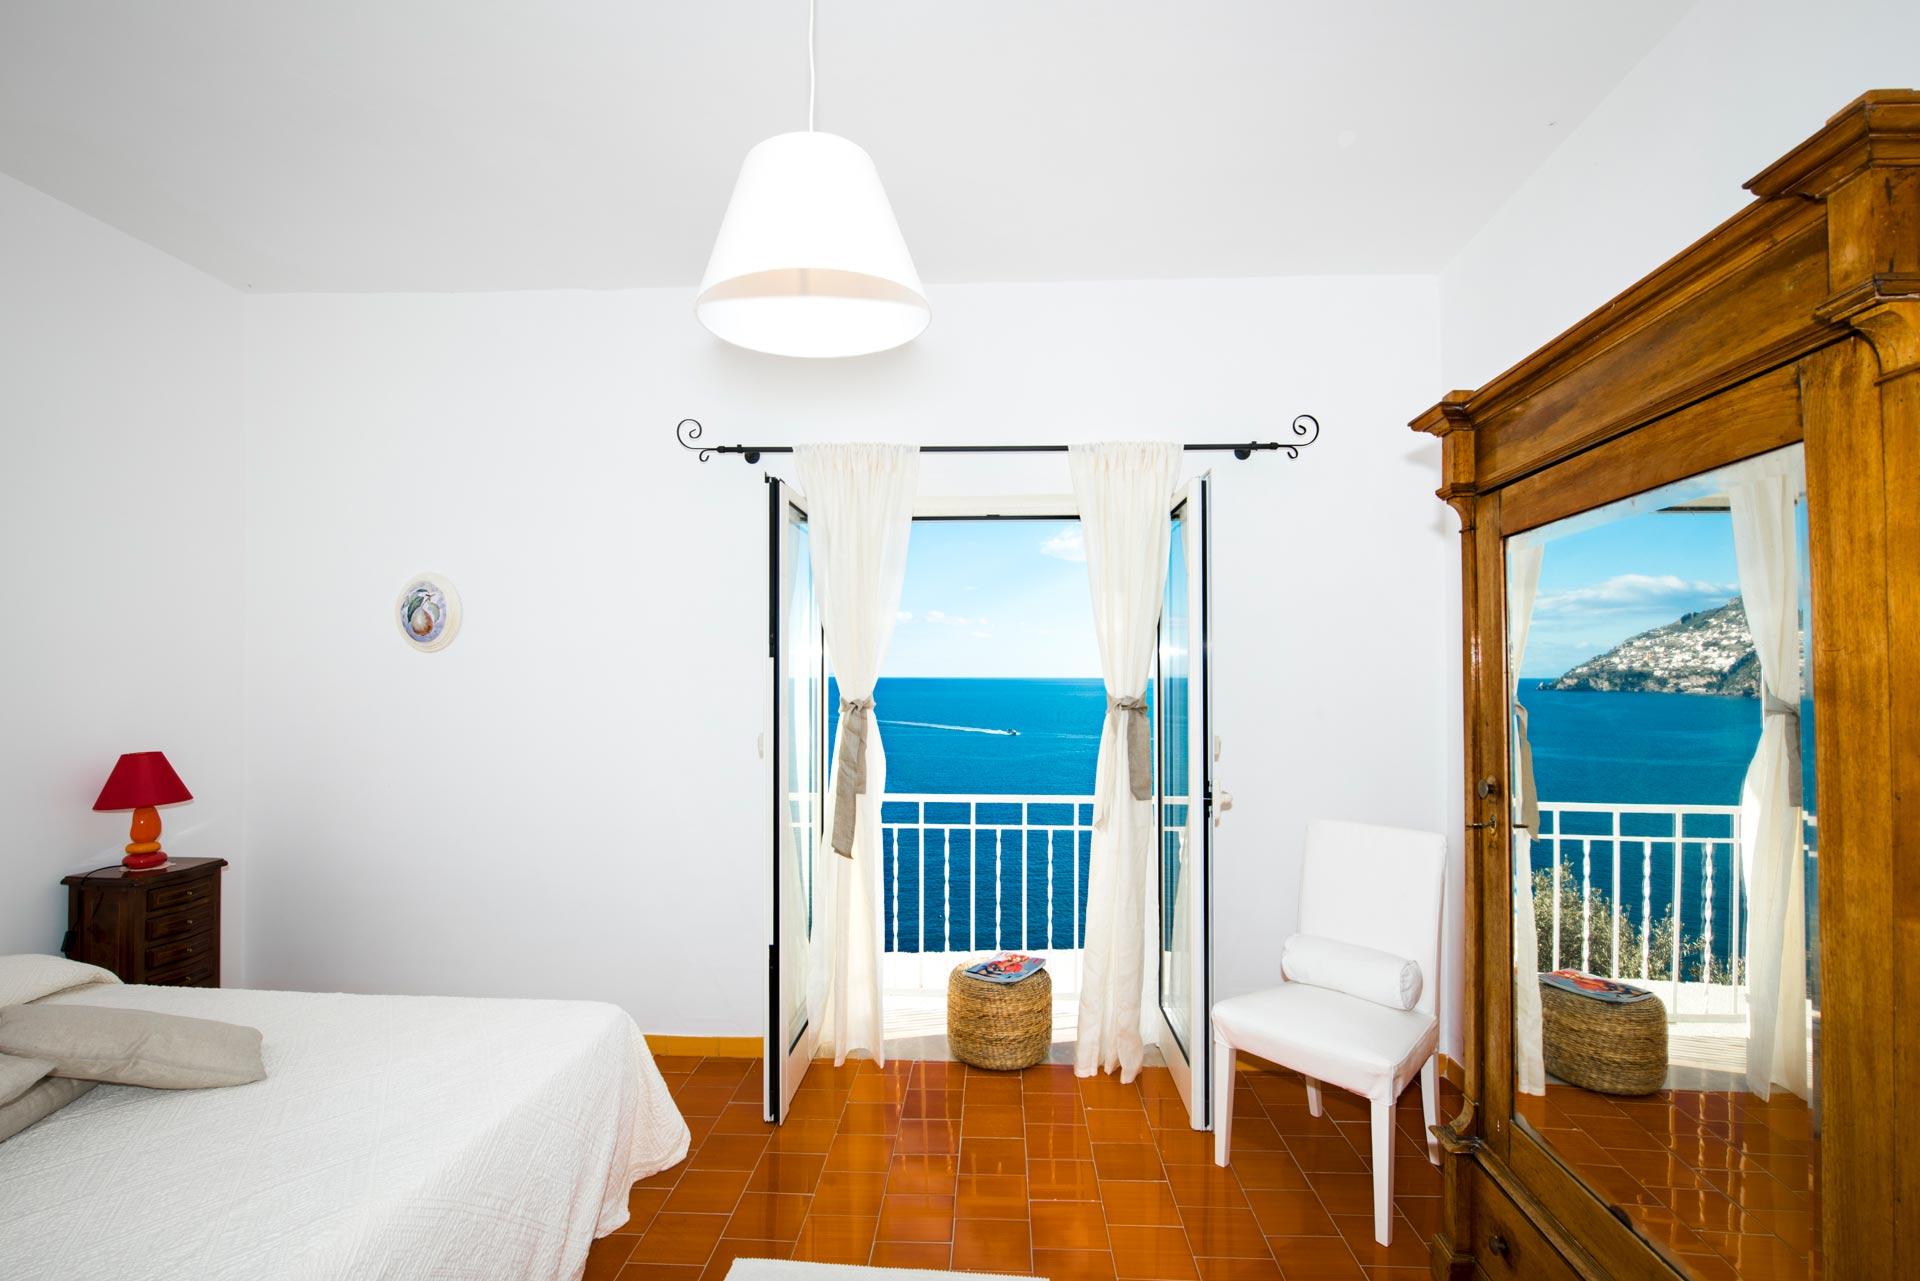 casa_fioravante_villa_positano_15_41